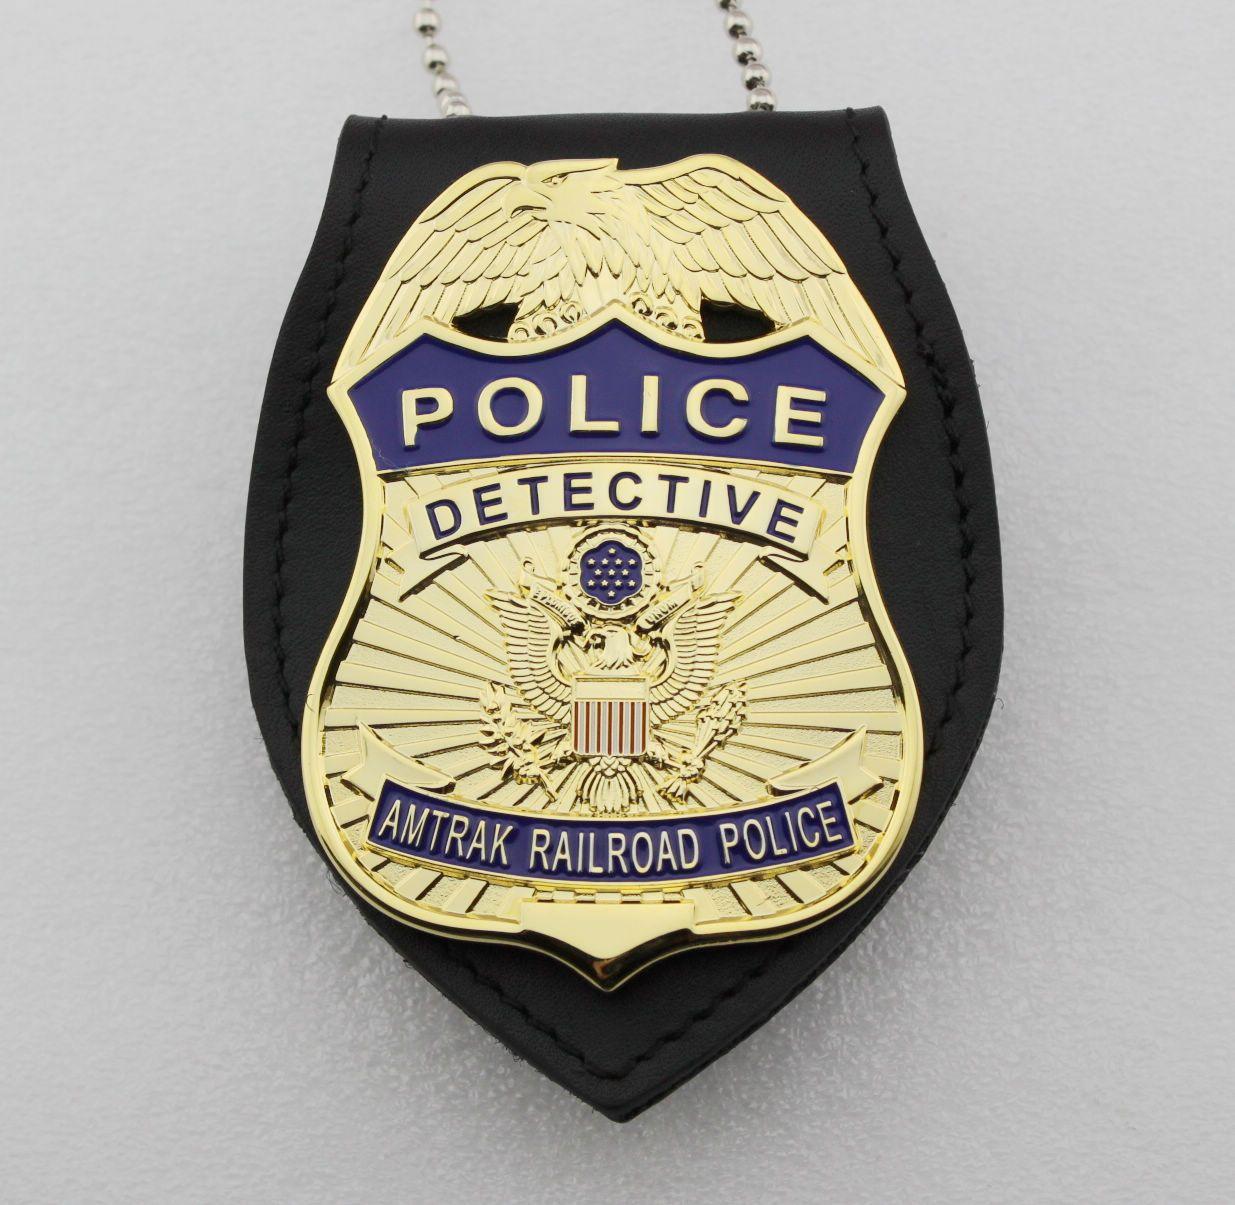 amtrak railway police detective metal badge replicdetective amtrak